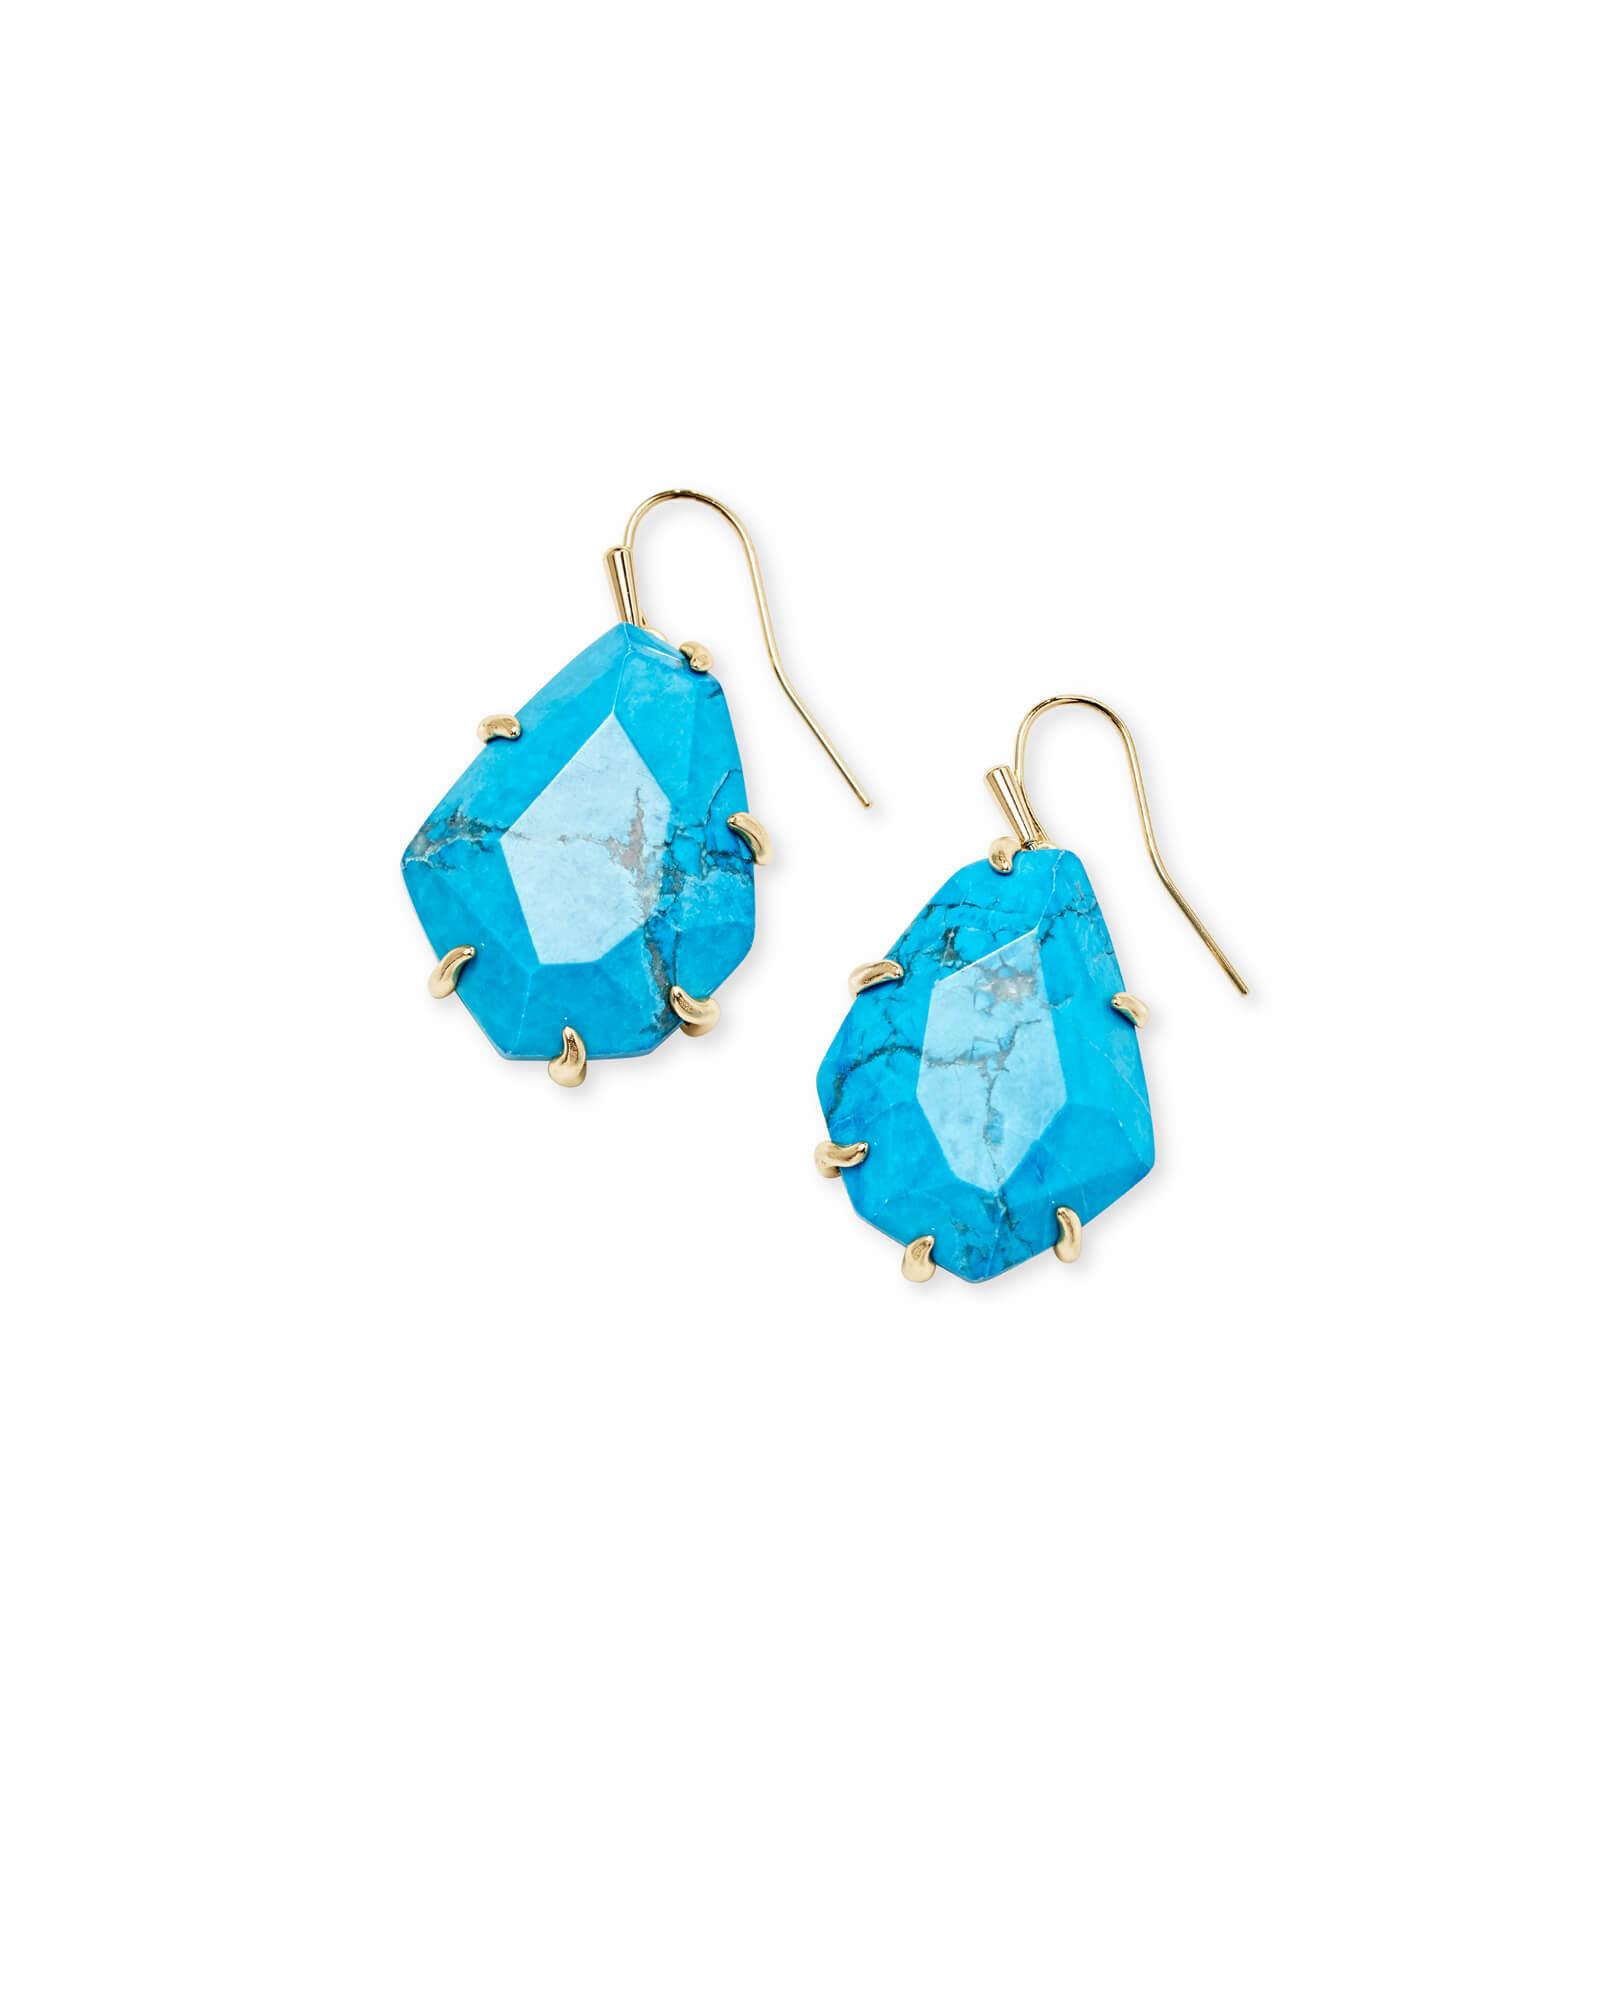 kendra-scott-rosenell-gold-drop-earrings-in-aqua-howlite_00_default_lg.jpg